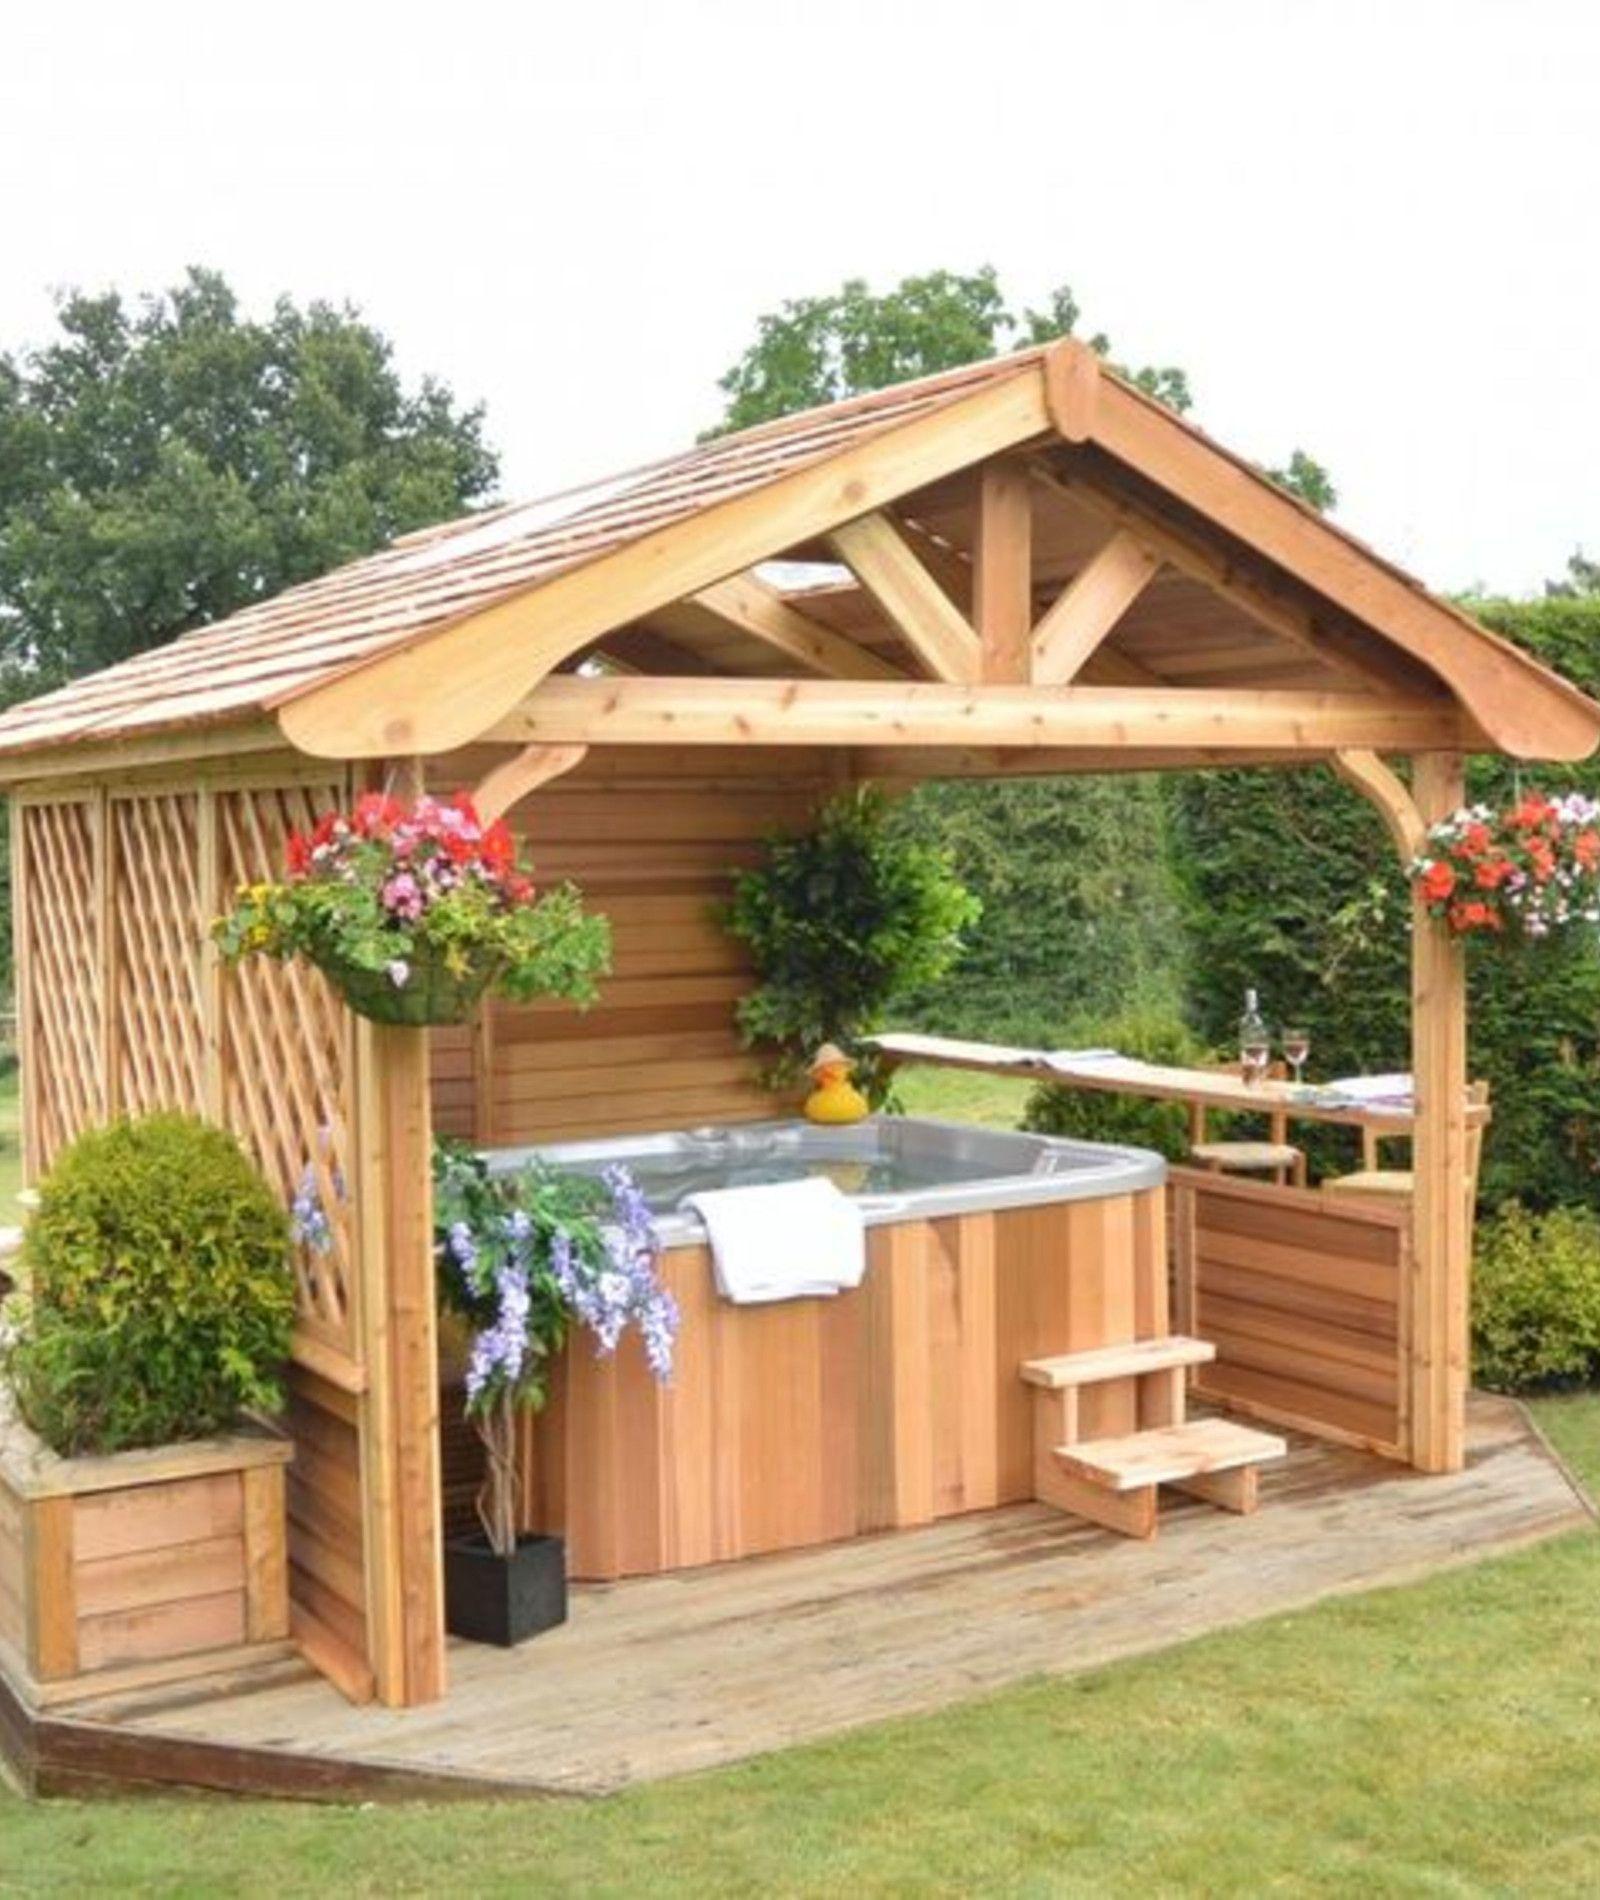 Ryan Shed Plans 12 000 Shed Plans And Designs For Easy Shed Building Ryanshedplans Hot Tub Landscaping Hot Tub Backyard Hot Tub Gazebo